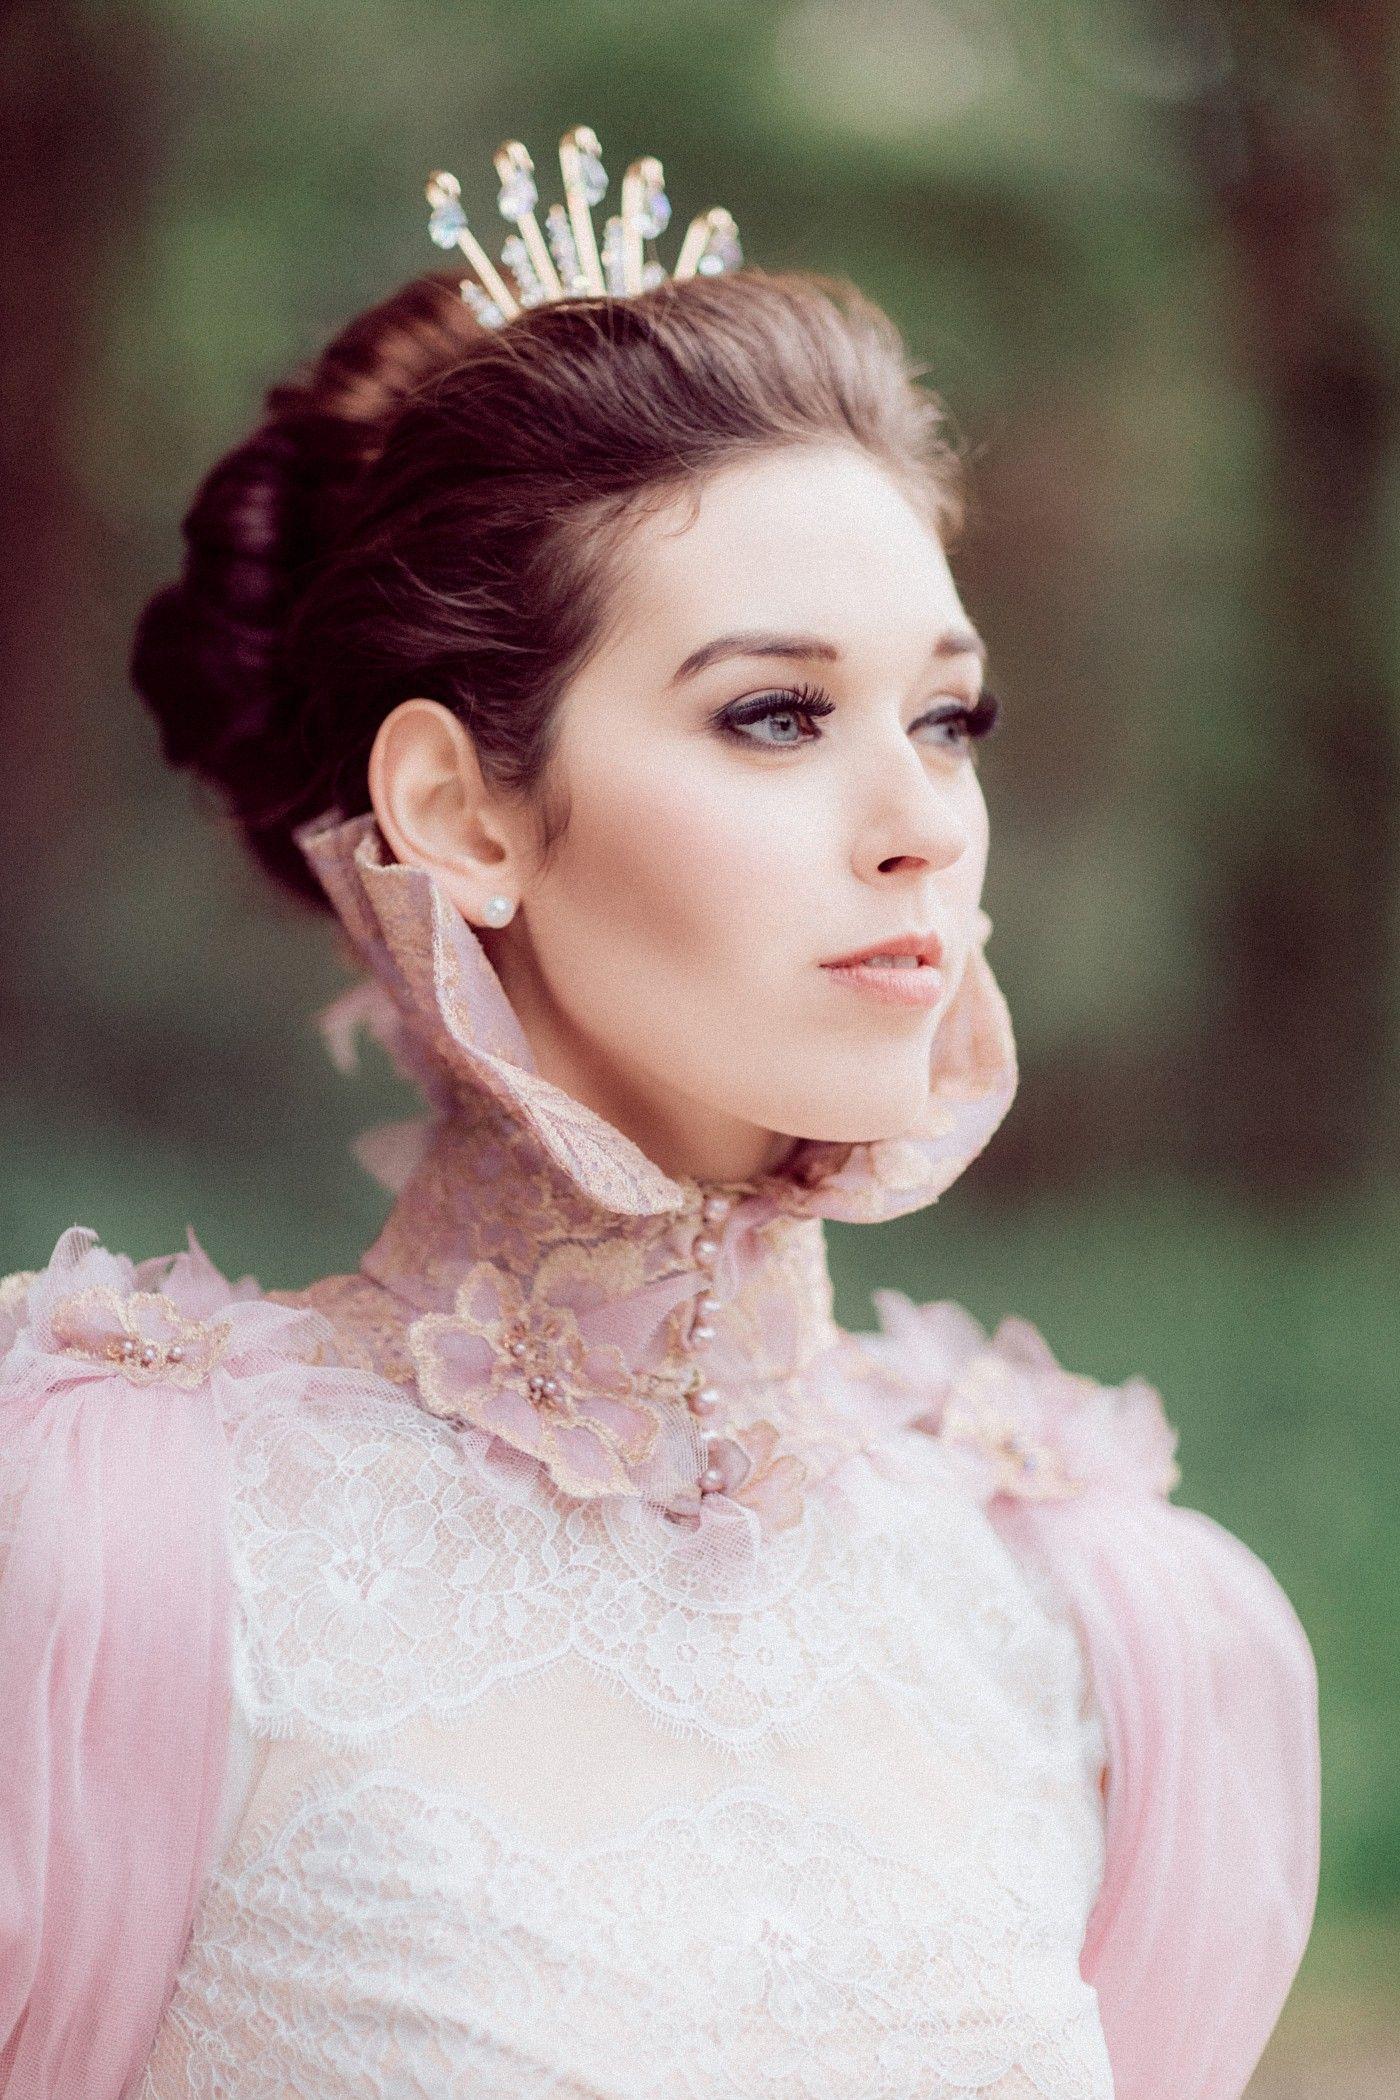 My Fair Lady Inspired Wedding Shoot - Regal Gown   Blush Pink ...